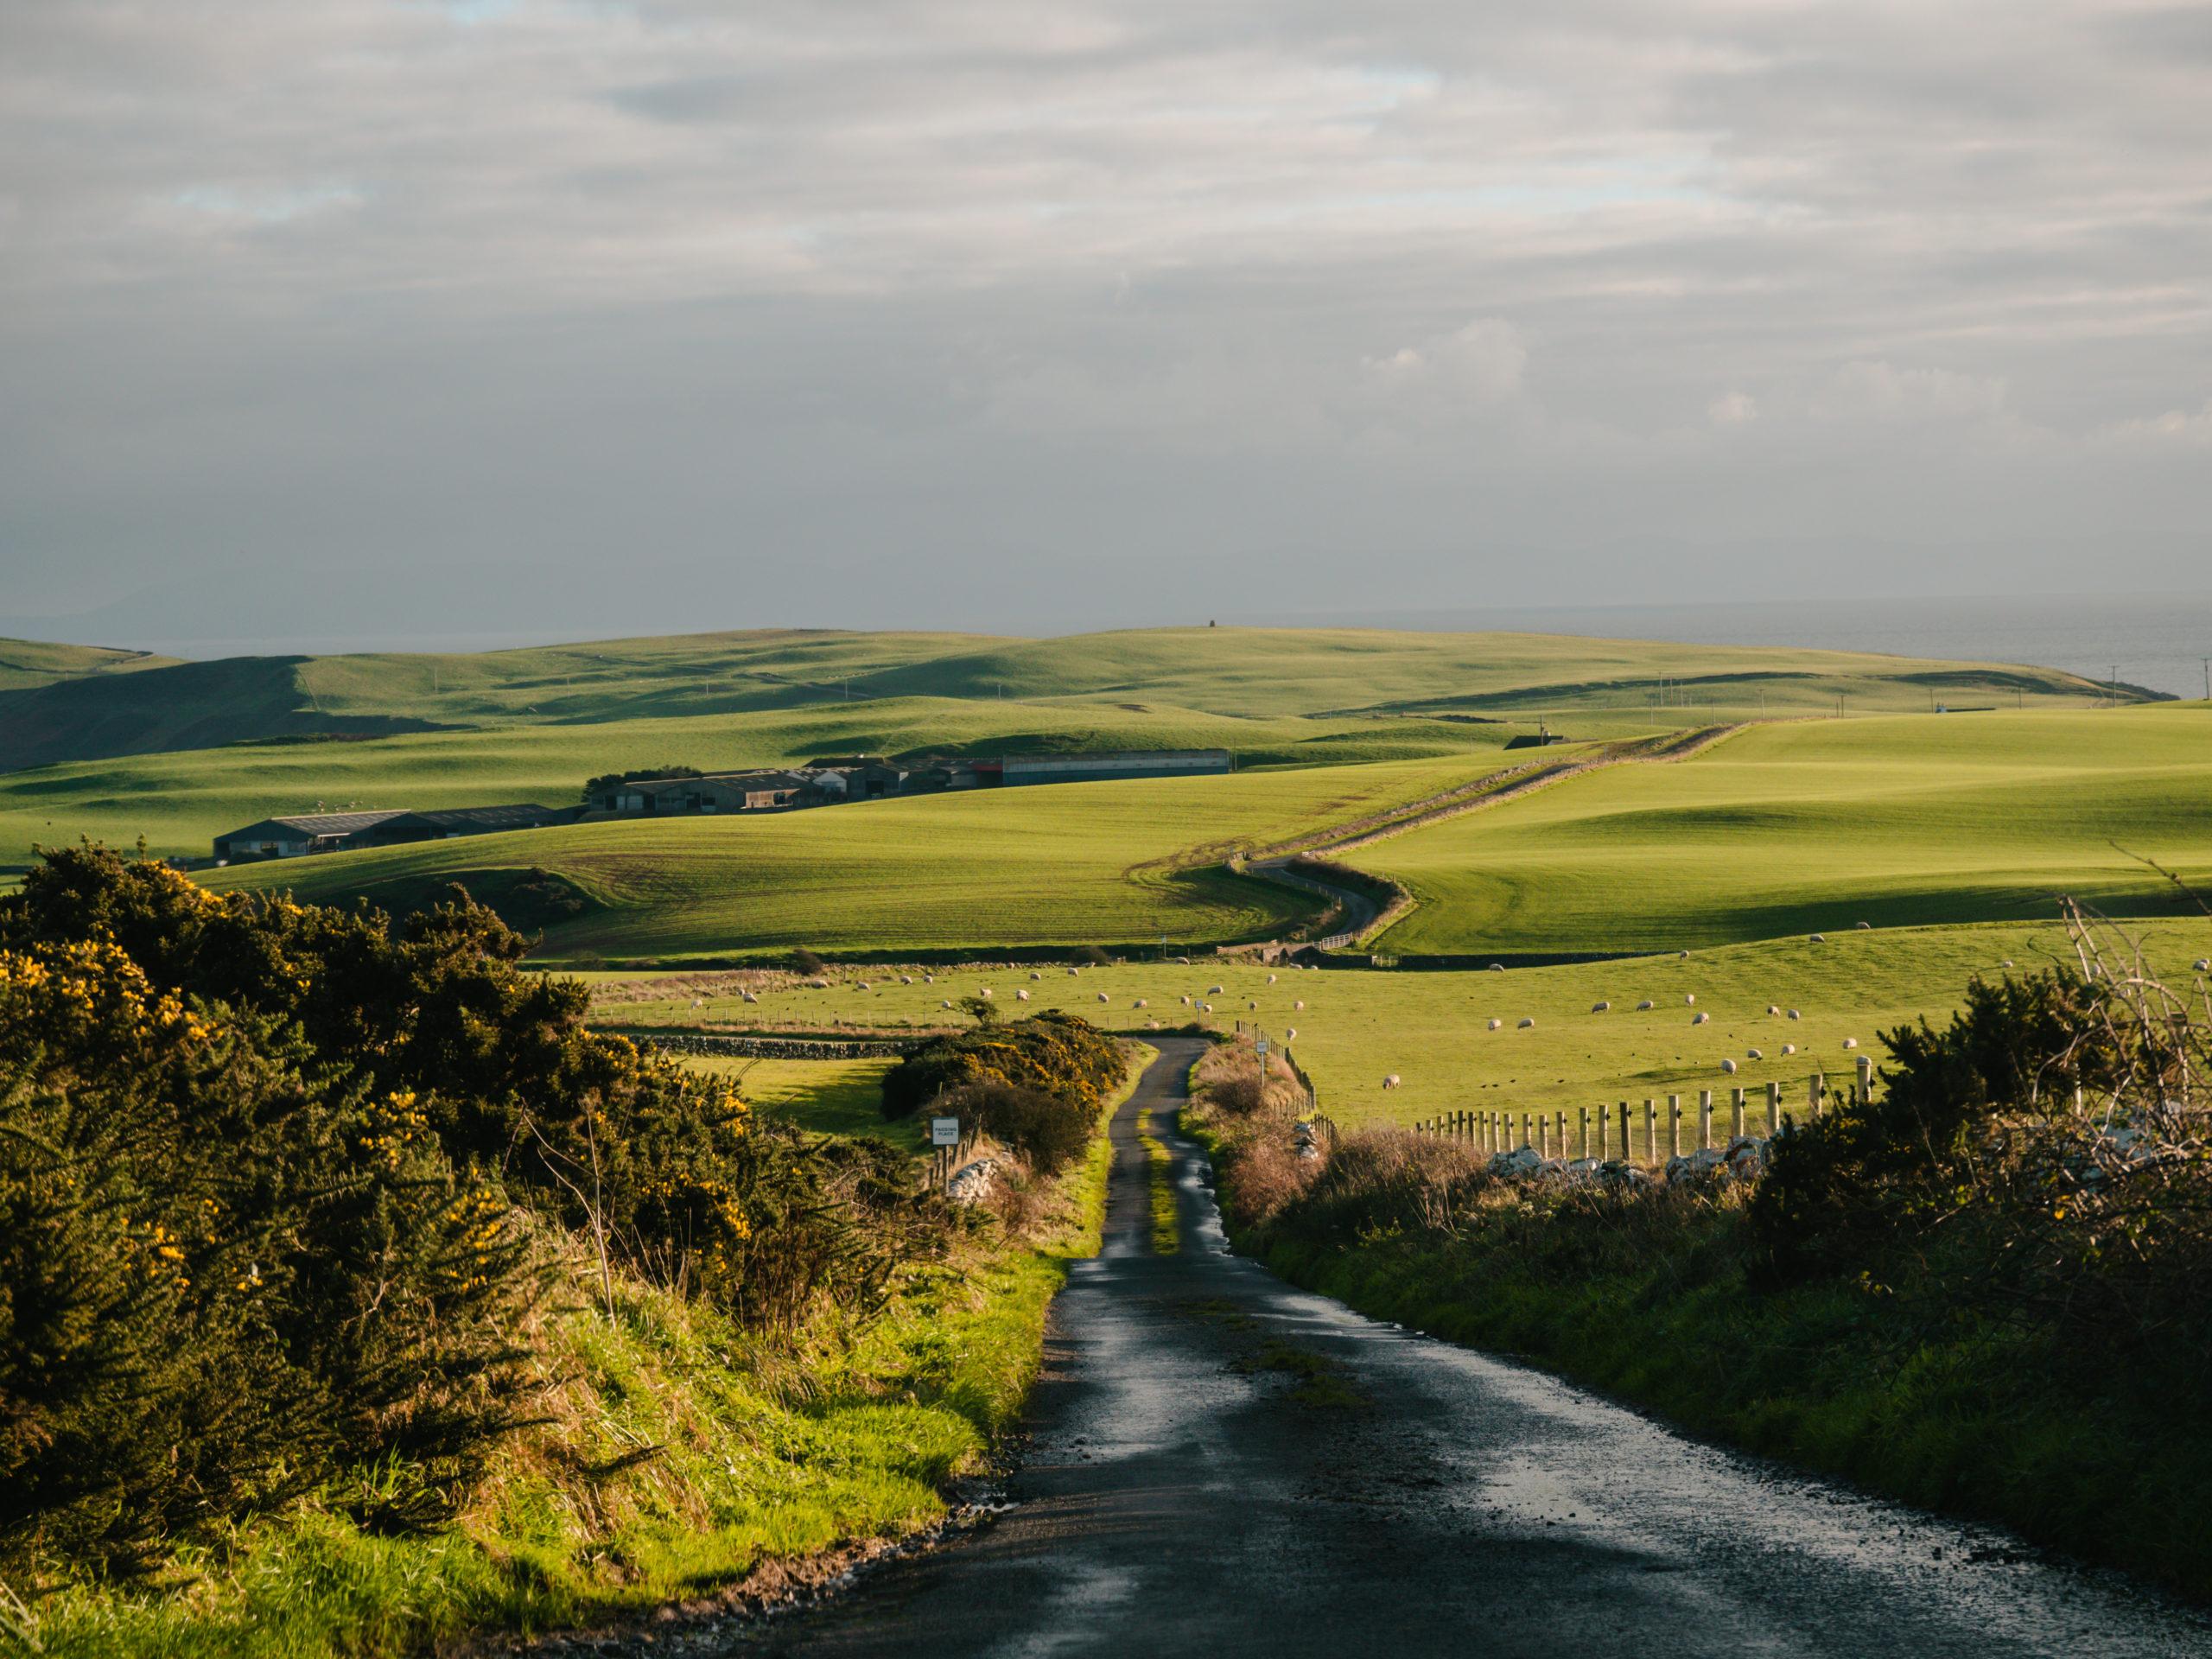 mull of galloway écosse herbe colline mer